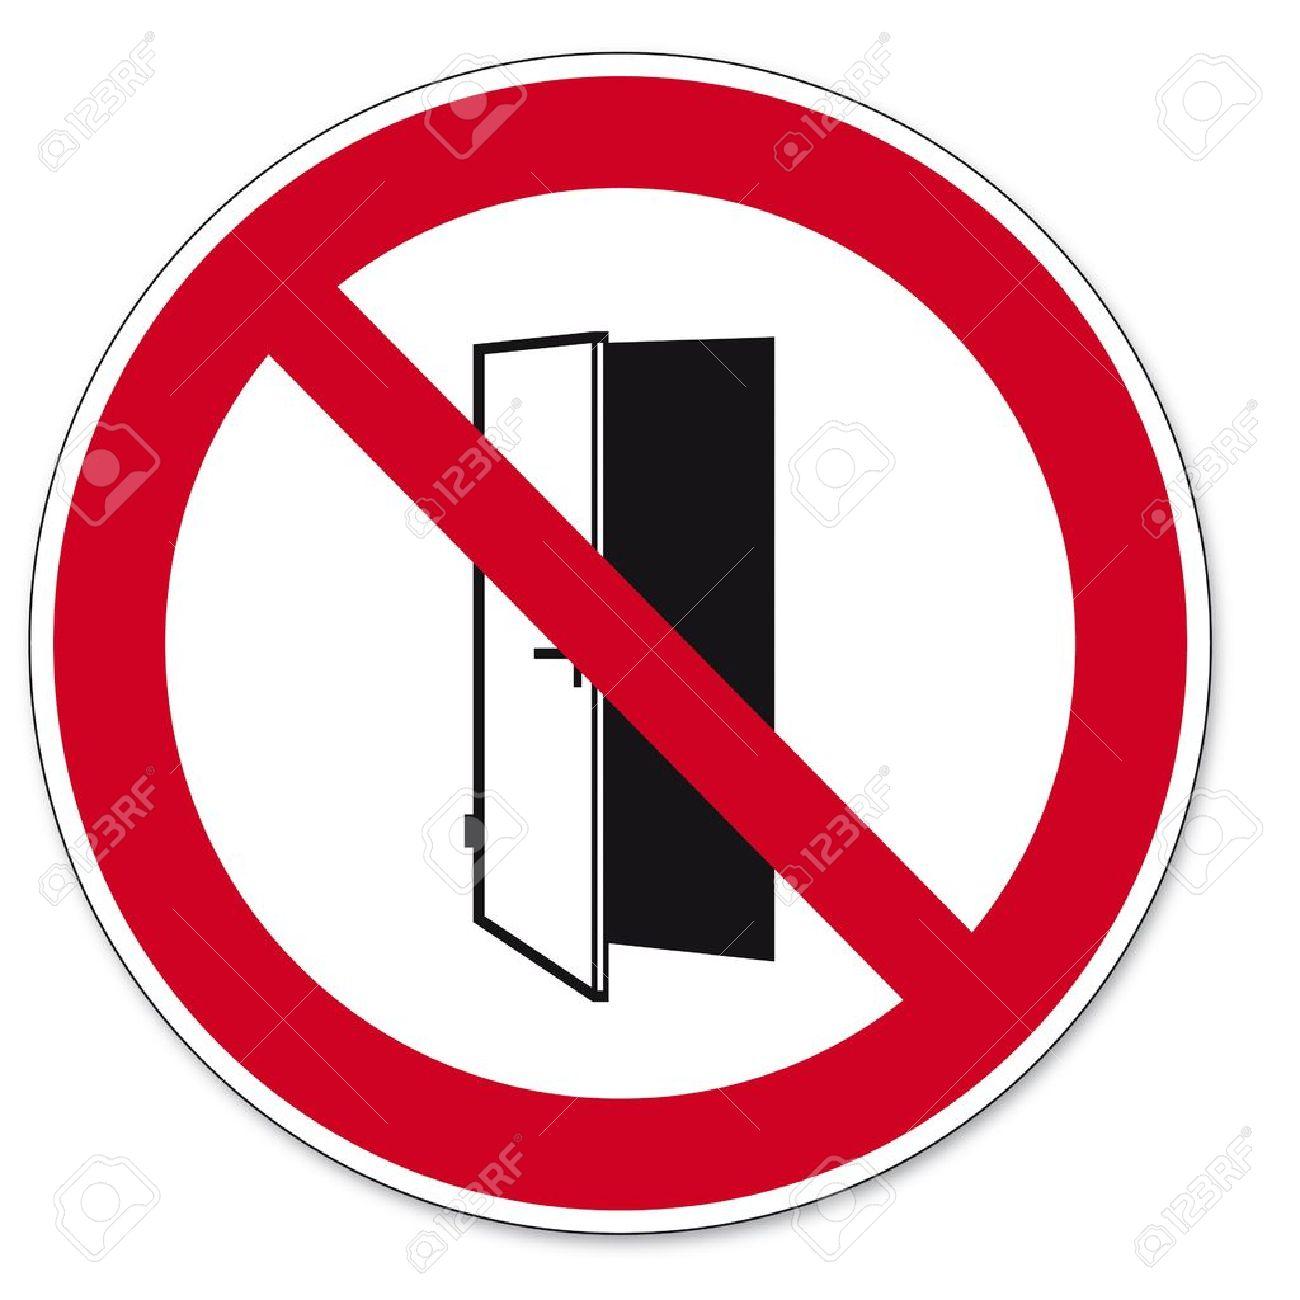 Prohibition signs BGV icon pictogram Doors do not close door open - 14492642